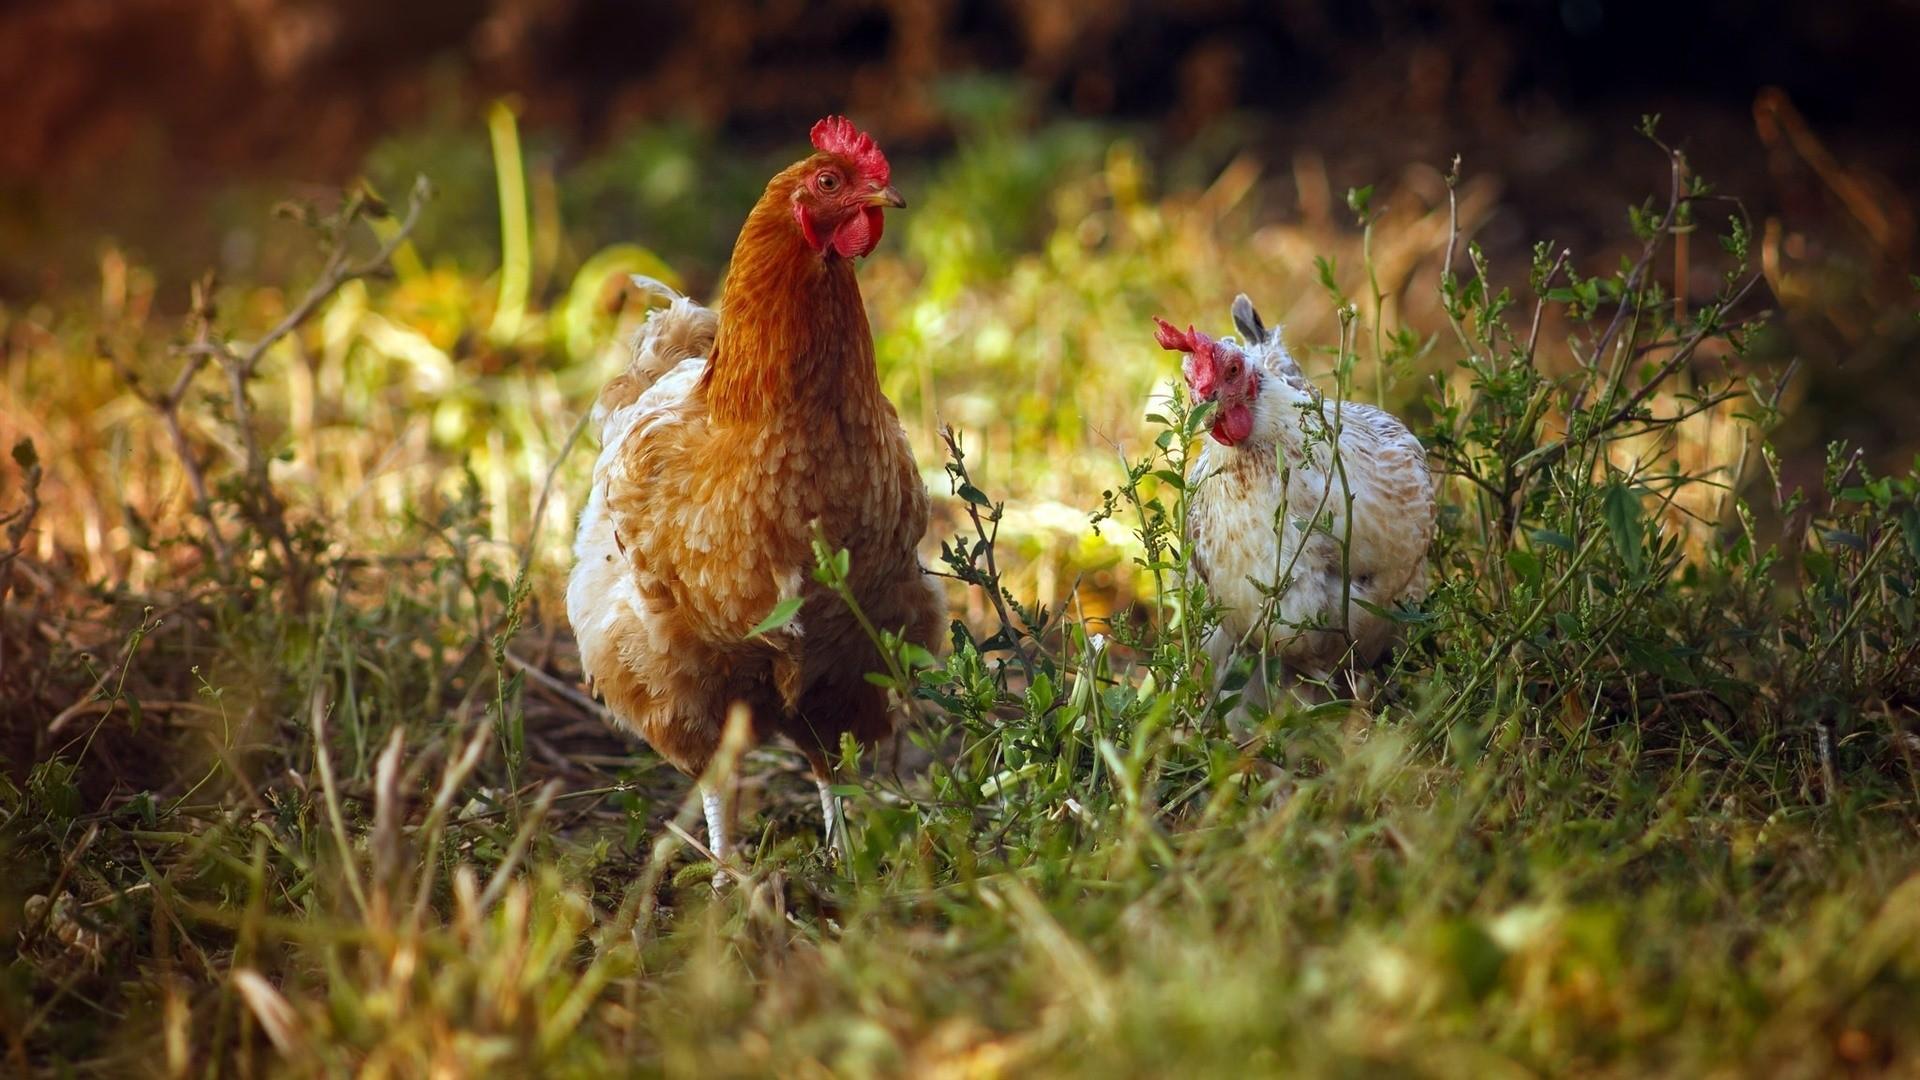 Chicken Wallpaper Picture hd